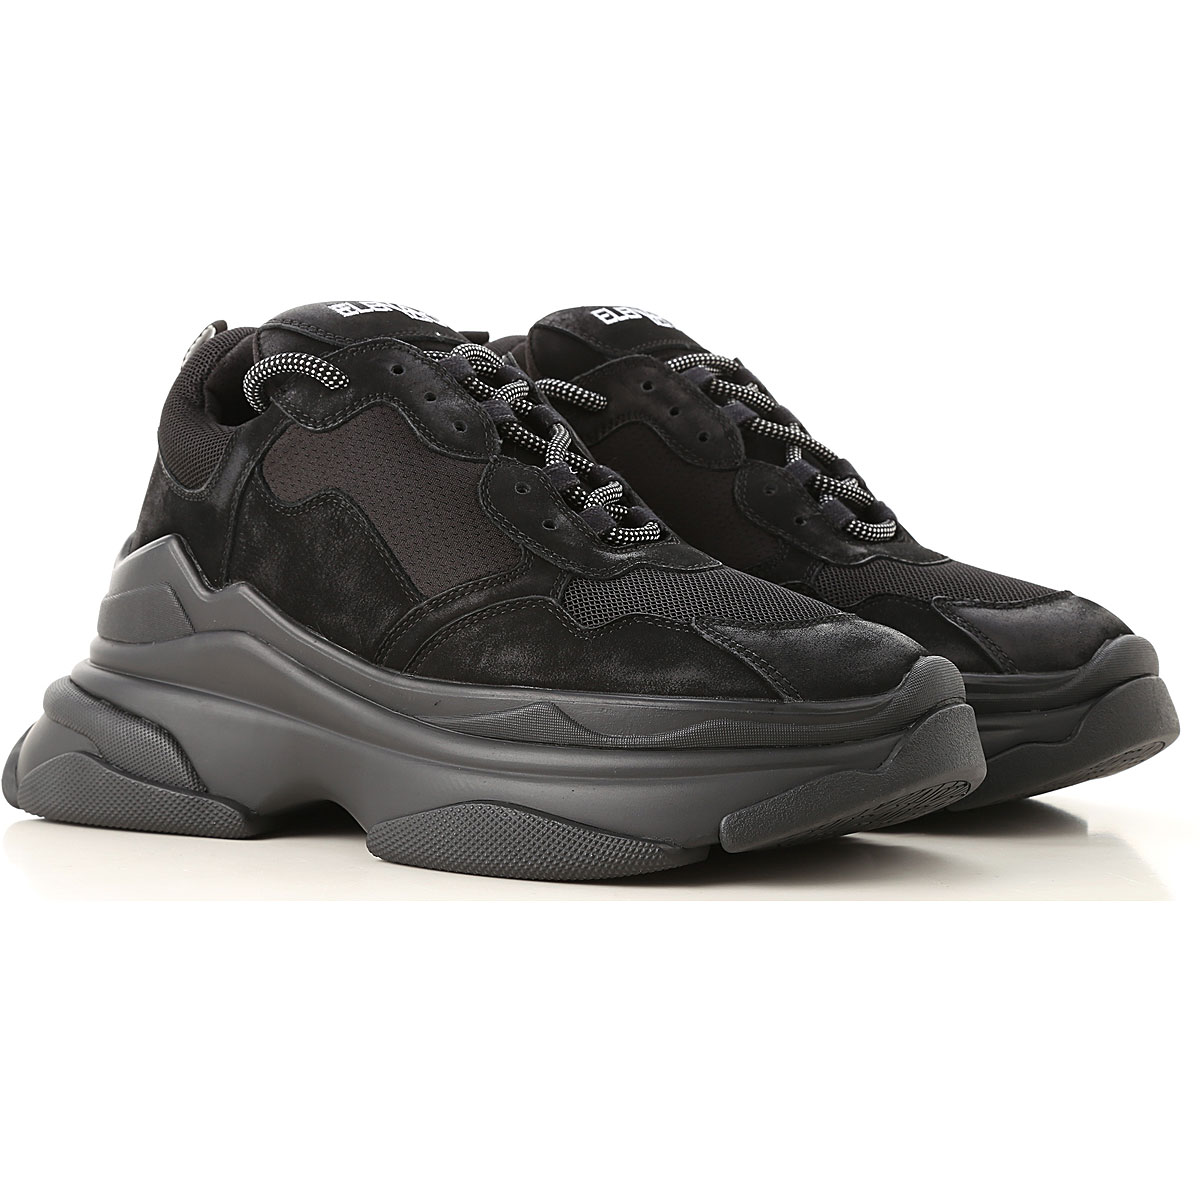 Image of Elena Iachi Sneakers for Women, Black, Fabric, 2017, 10 6 7 8 9